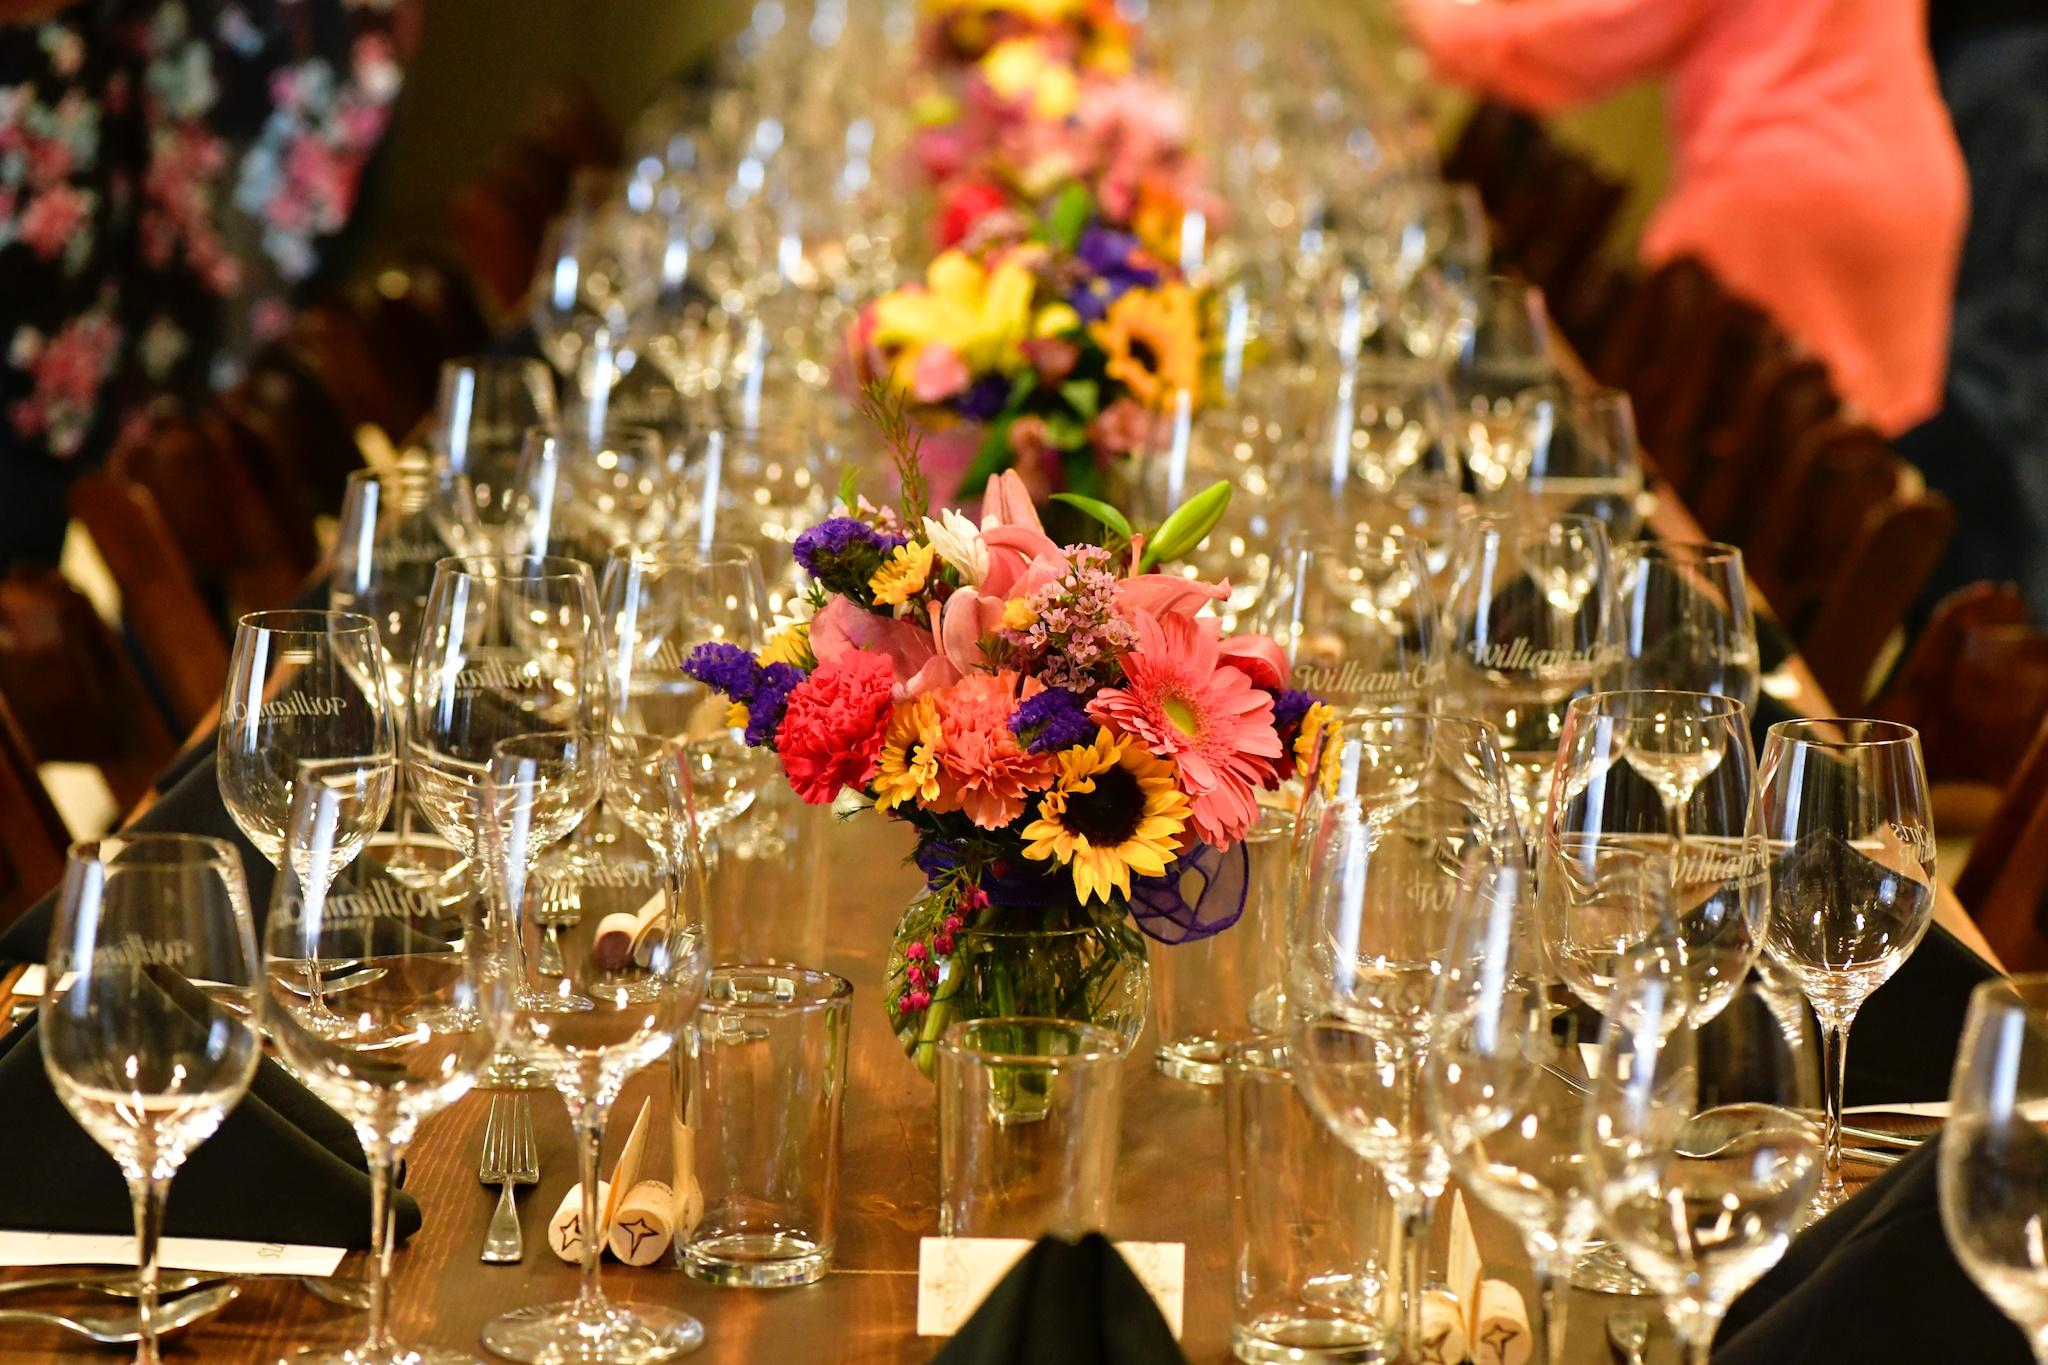 William Chris Vineyards Wine Dinner Table Setting